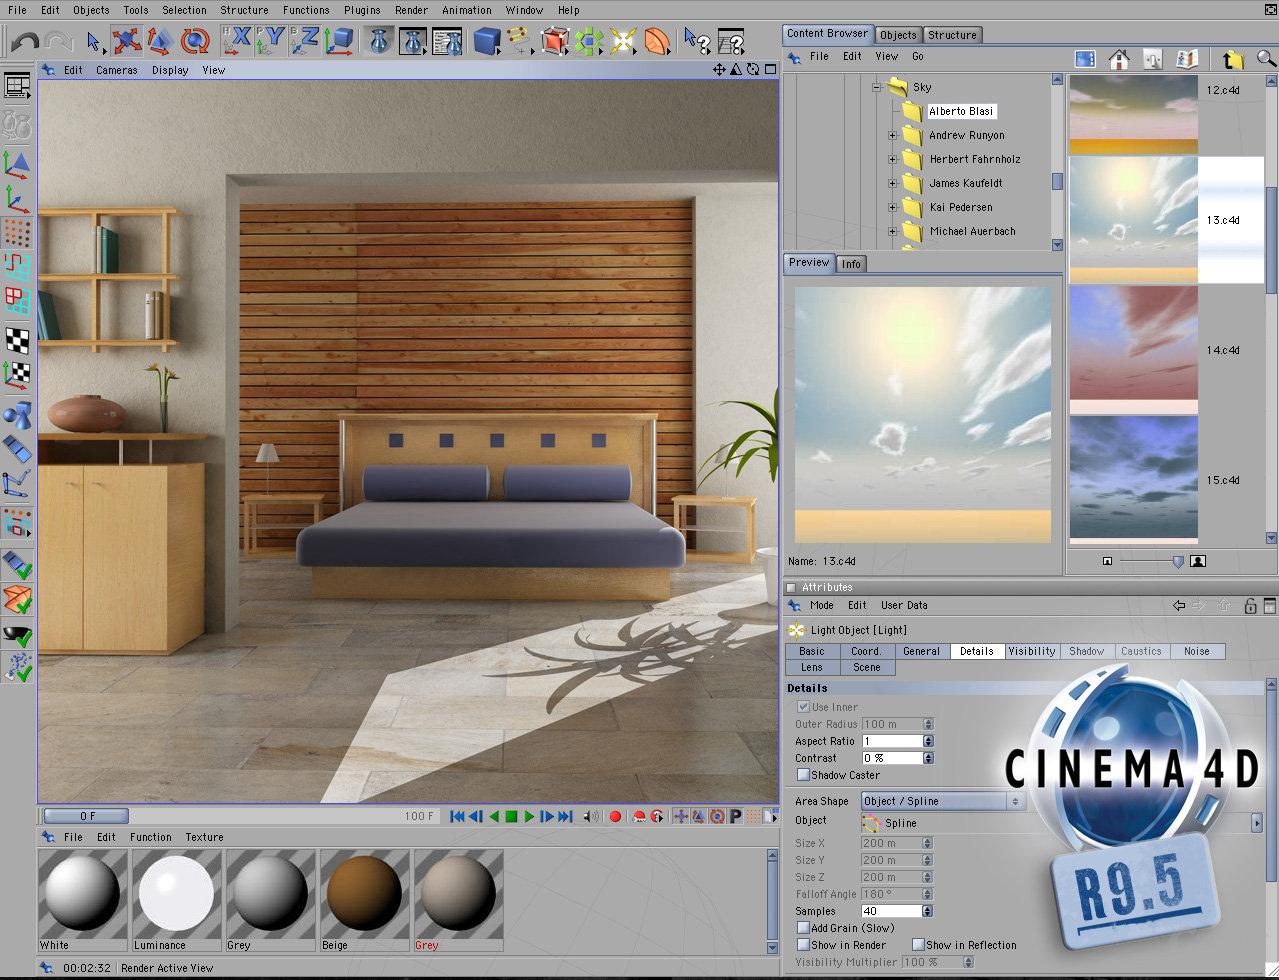 Maxon Cinema 4D R9.5